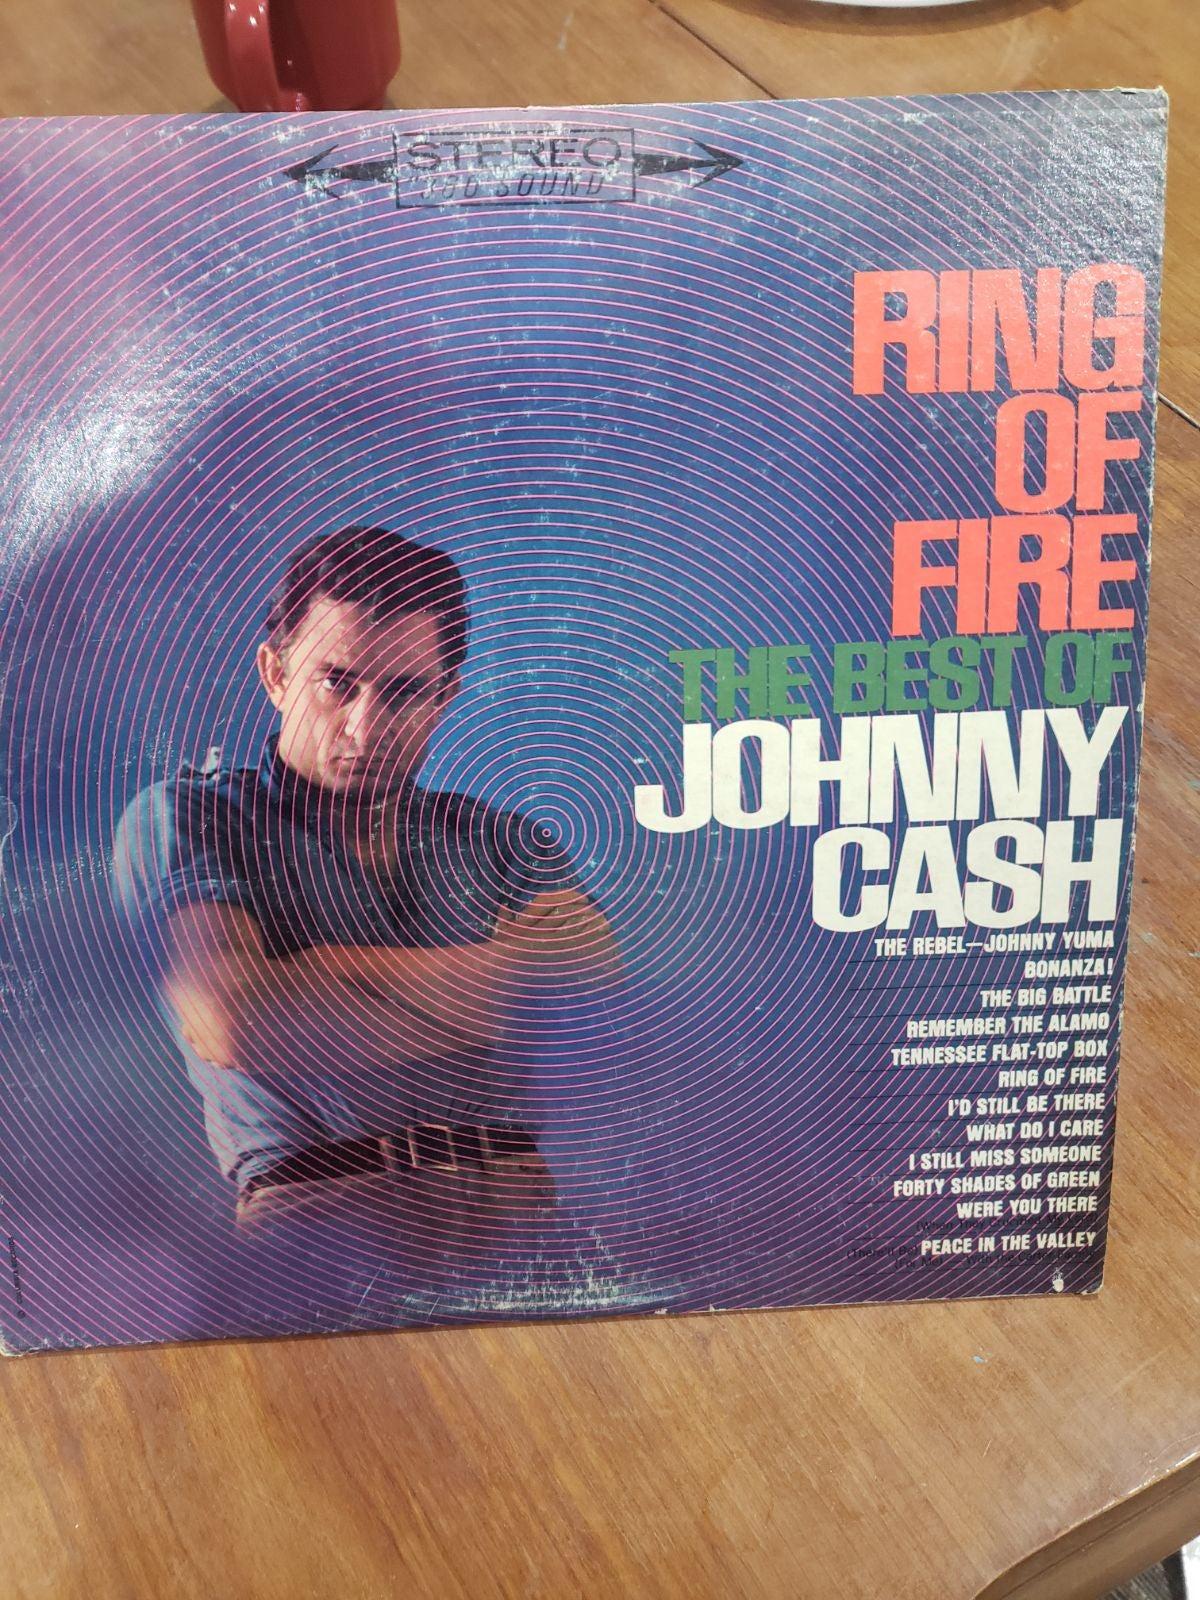 Johnny Cash Ring of fire vinyl record